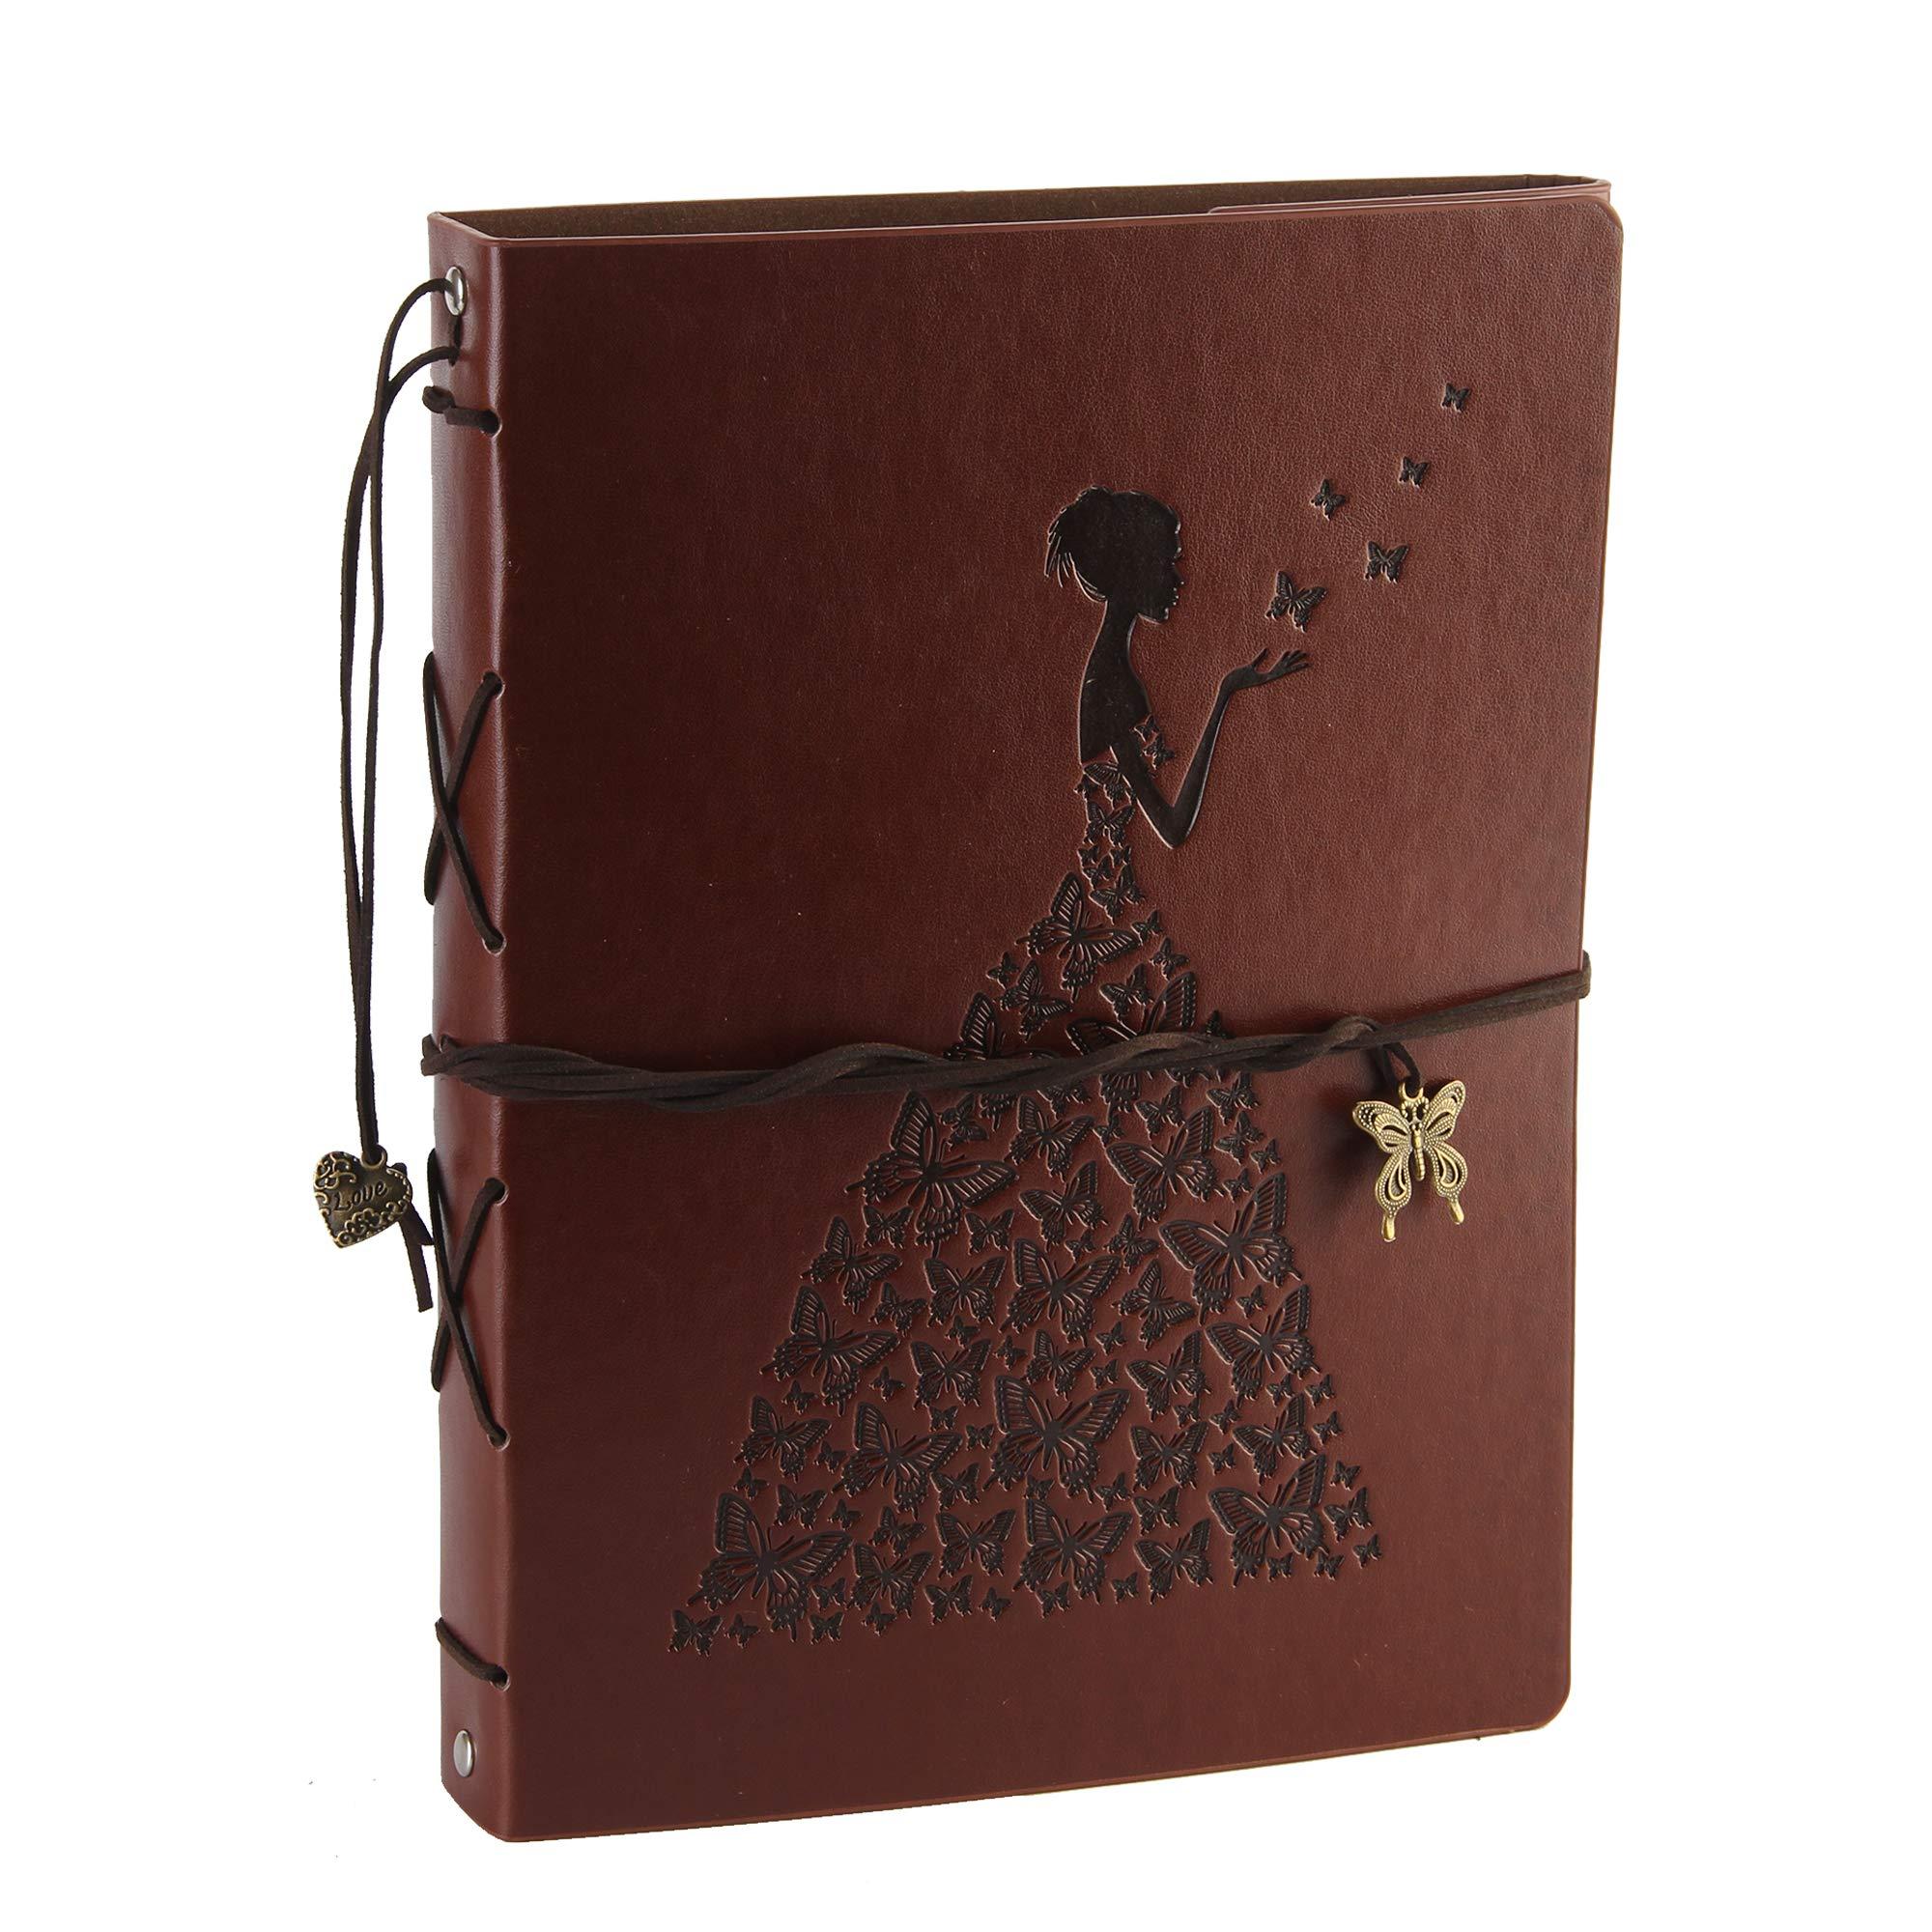 Photo Album Scrapbook Vintage Leather Cover 60 Pages Premium Black Paper Memory